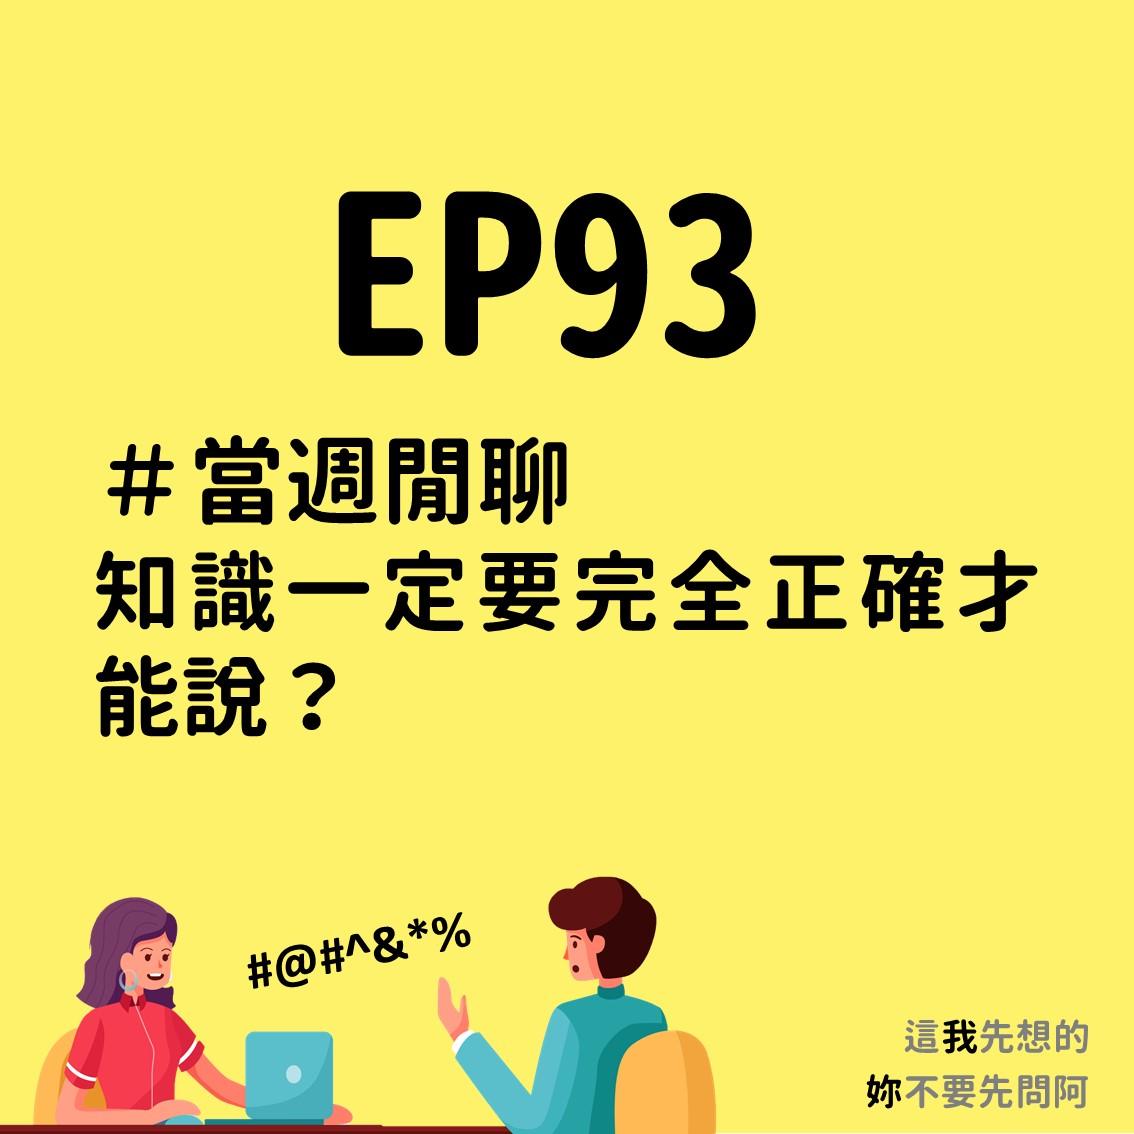 EP93 當週閒聊 知識一定要完全正確才能說?